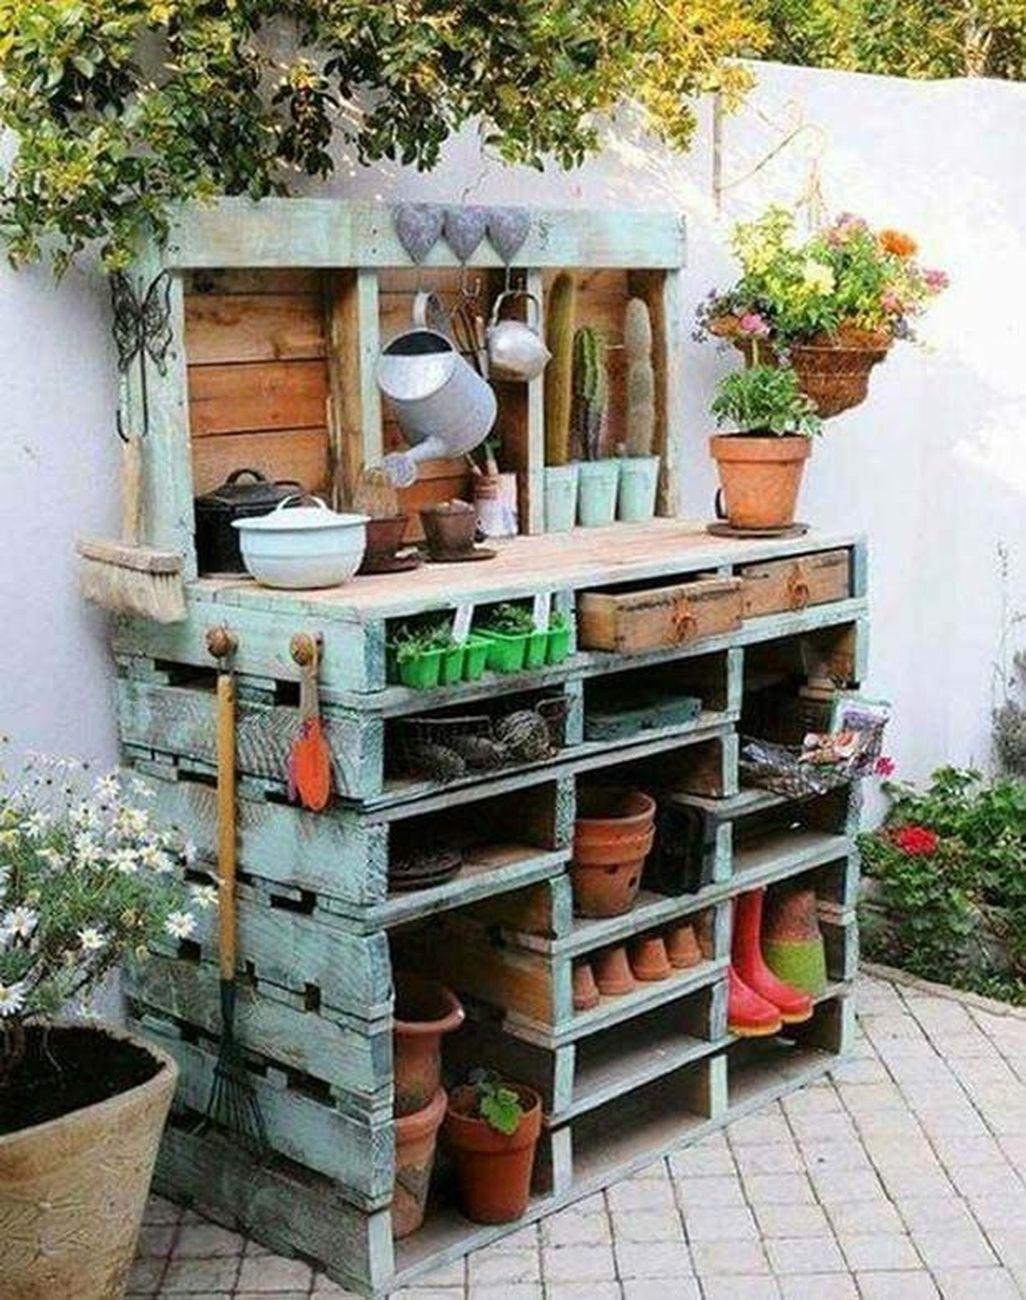 Creative DIY Patio Gardens Ideas On A Budget 31